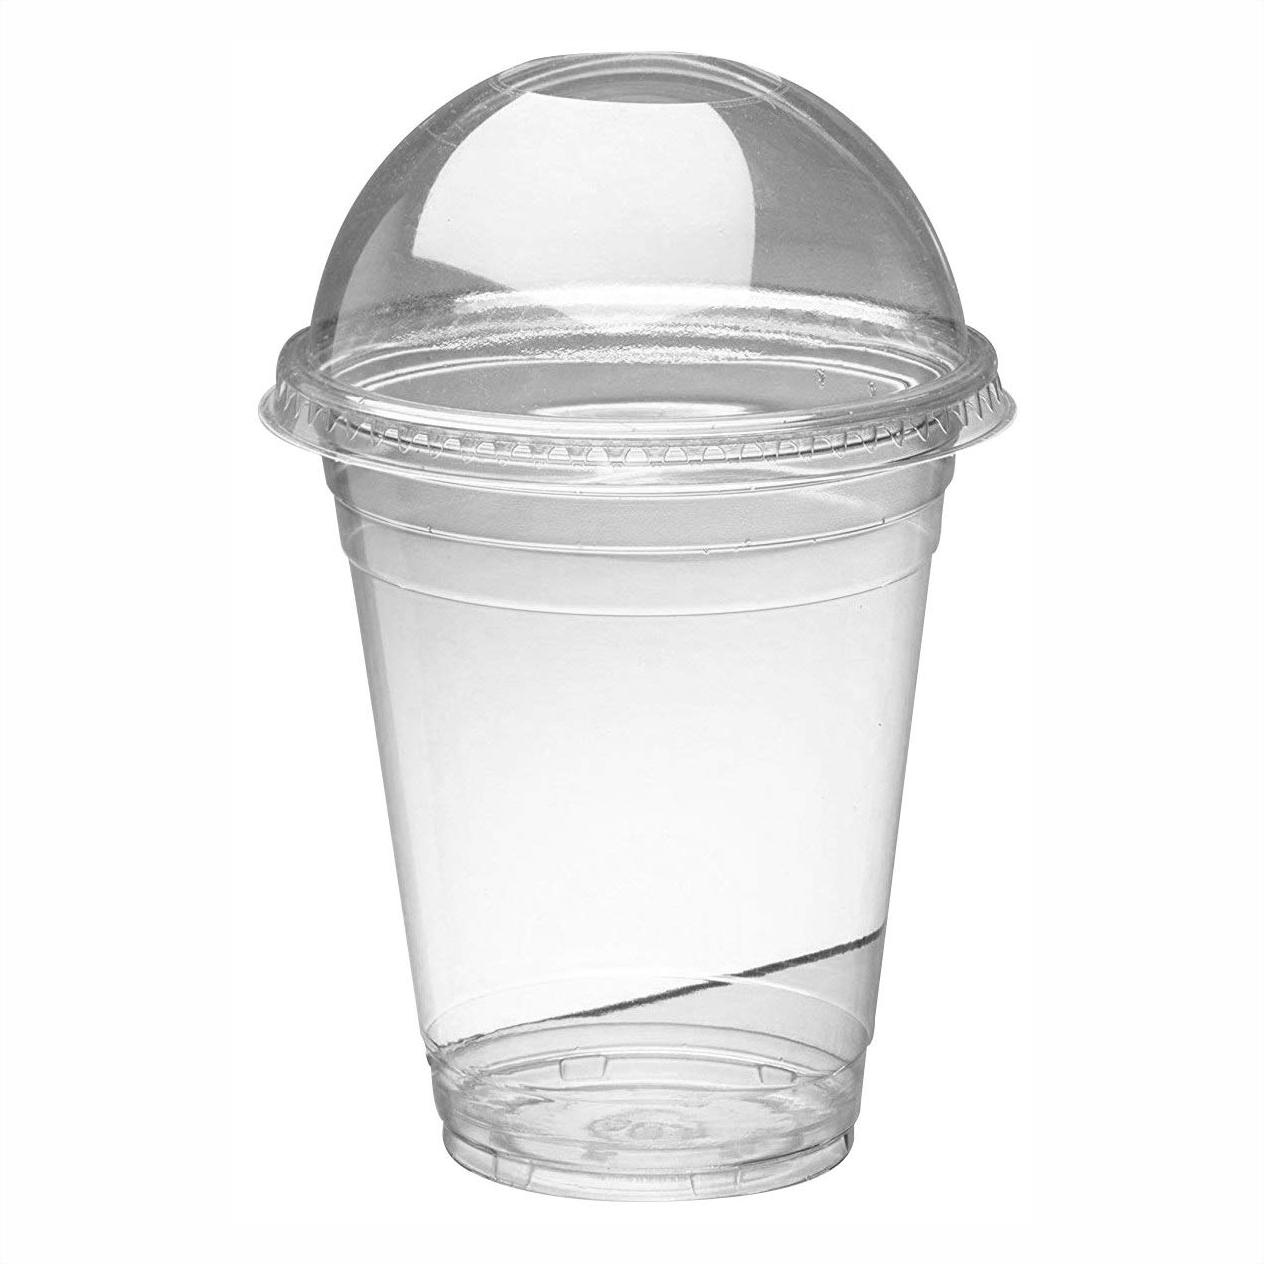 50 x 8oz Smoothie Cups with Domed Lids & Jumbo Straws Milkshakes Sweets Juice 3